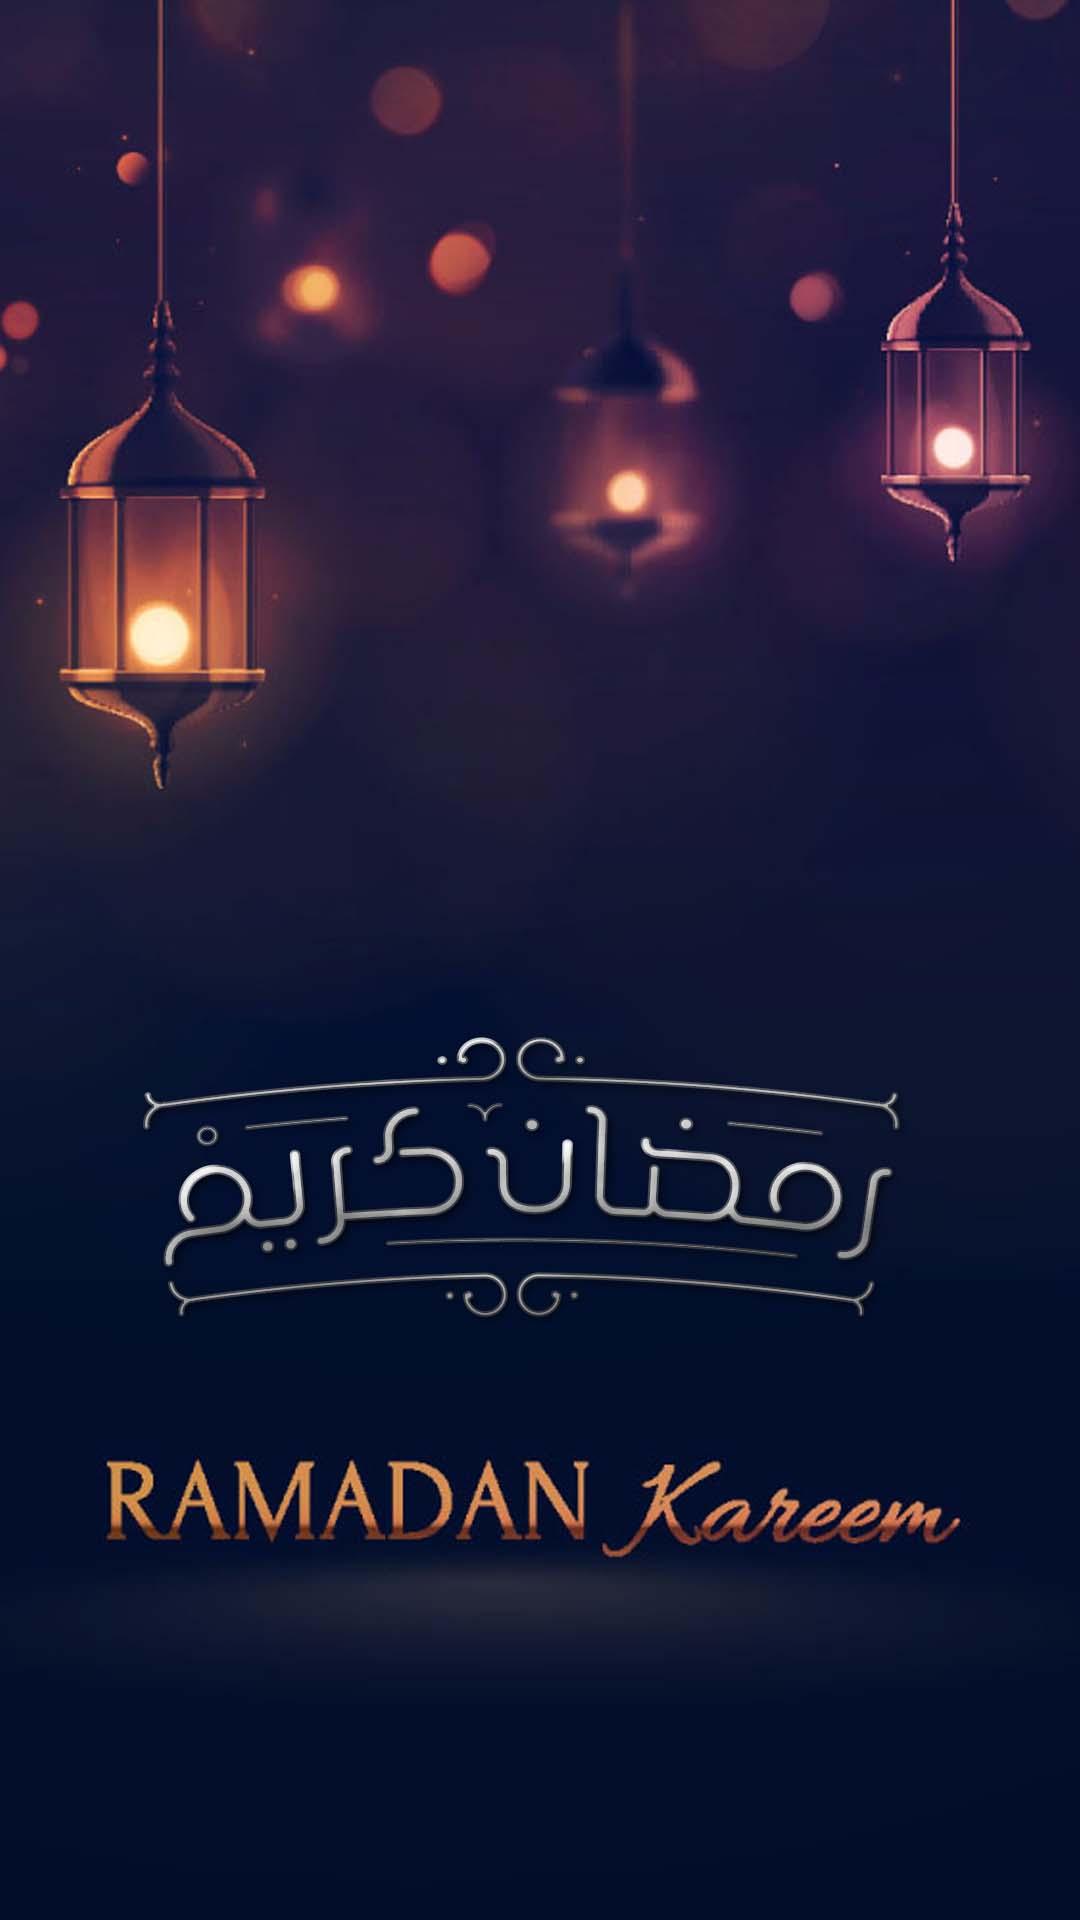 خلفيات موبايل رمضان كريم Mobile Wallpapers HD 16 خلفيات موبايل رمضان كريم Mobile Wallpapers HD